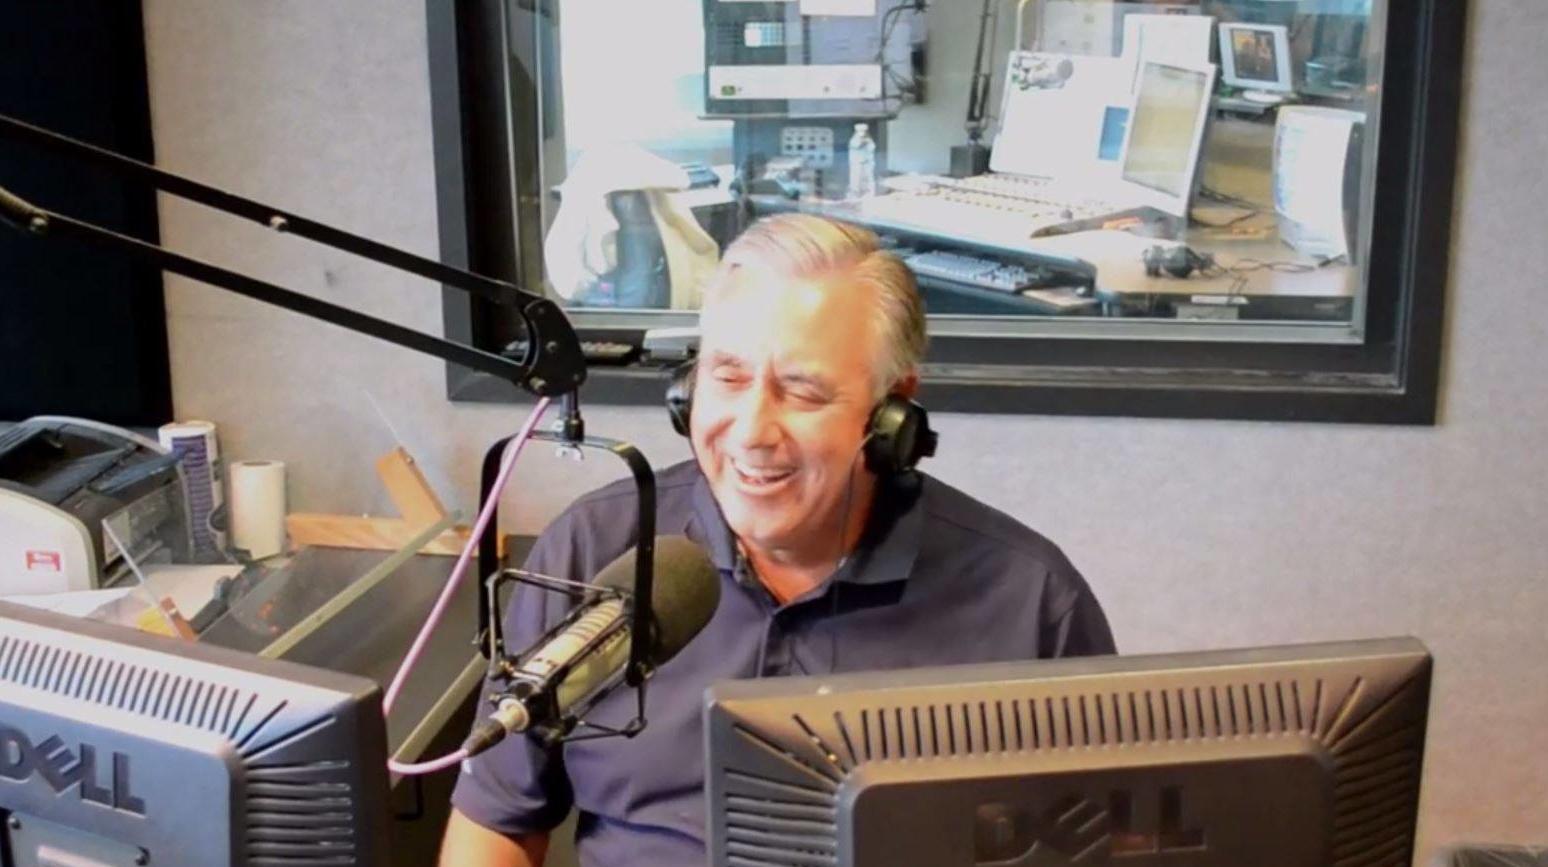 Gary Sullivan interviews the President of Drain-FX